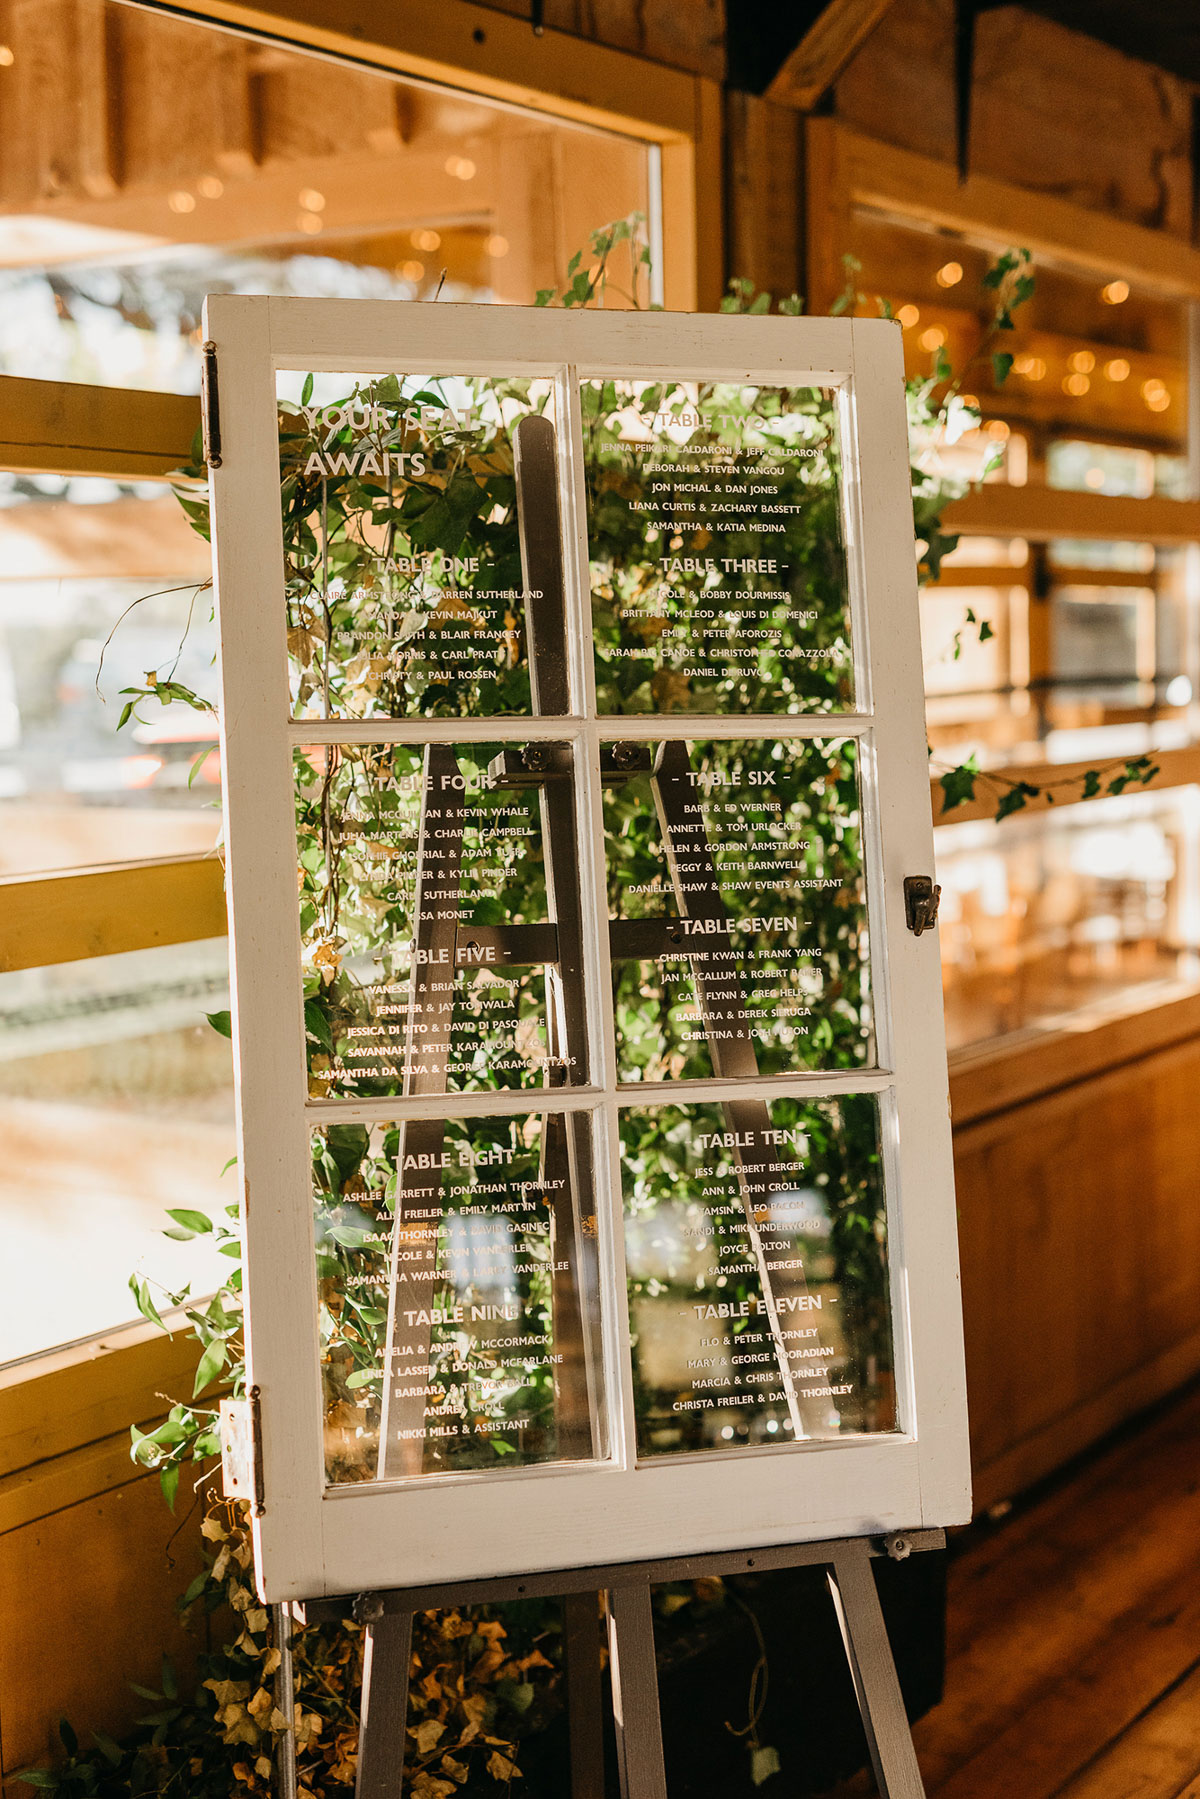 shaw-events-vineyard-bride-swish-list-kurtz-orchards-niagara-on-the-lake-wedding-51.jpg